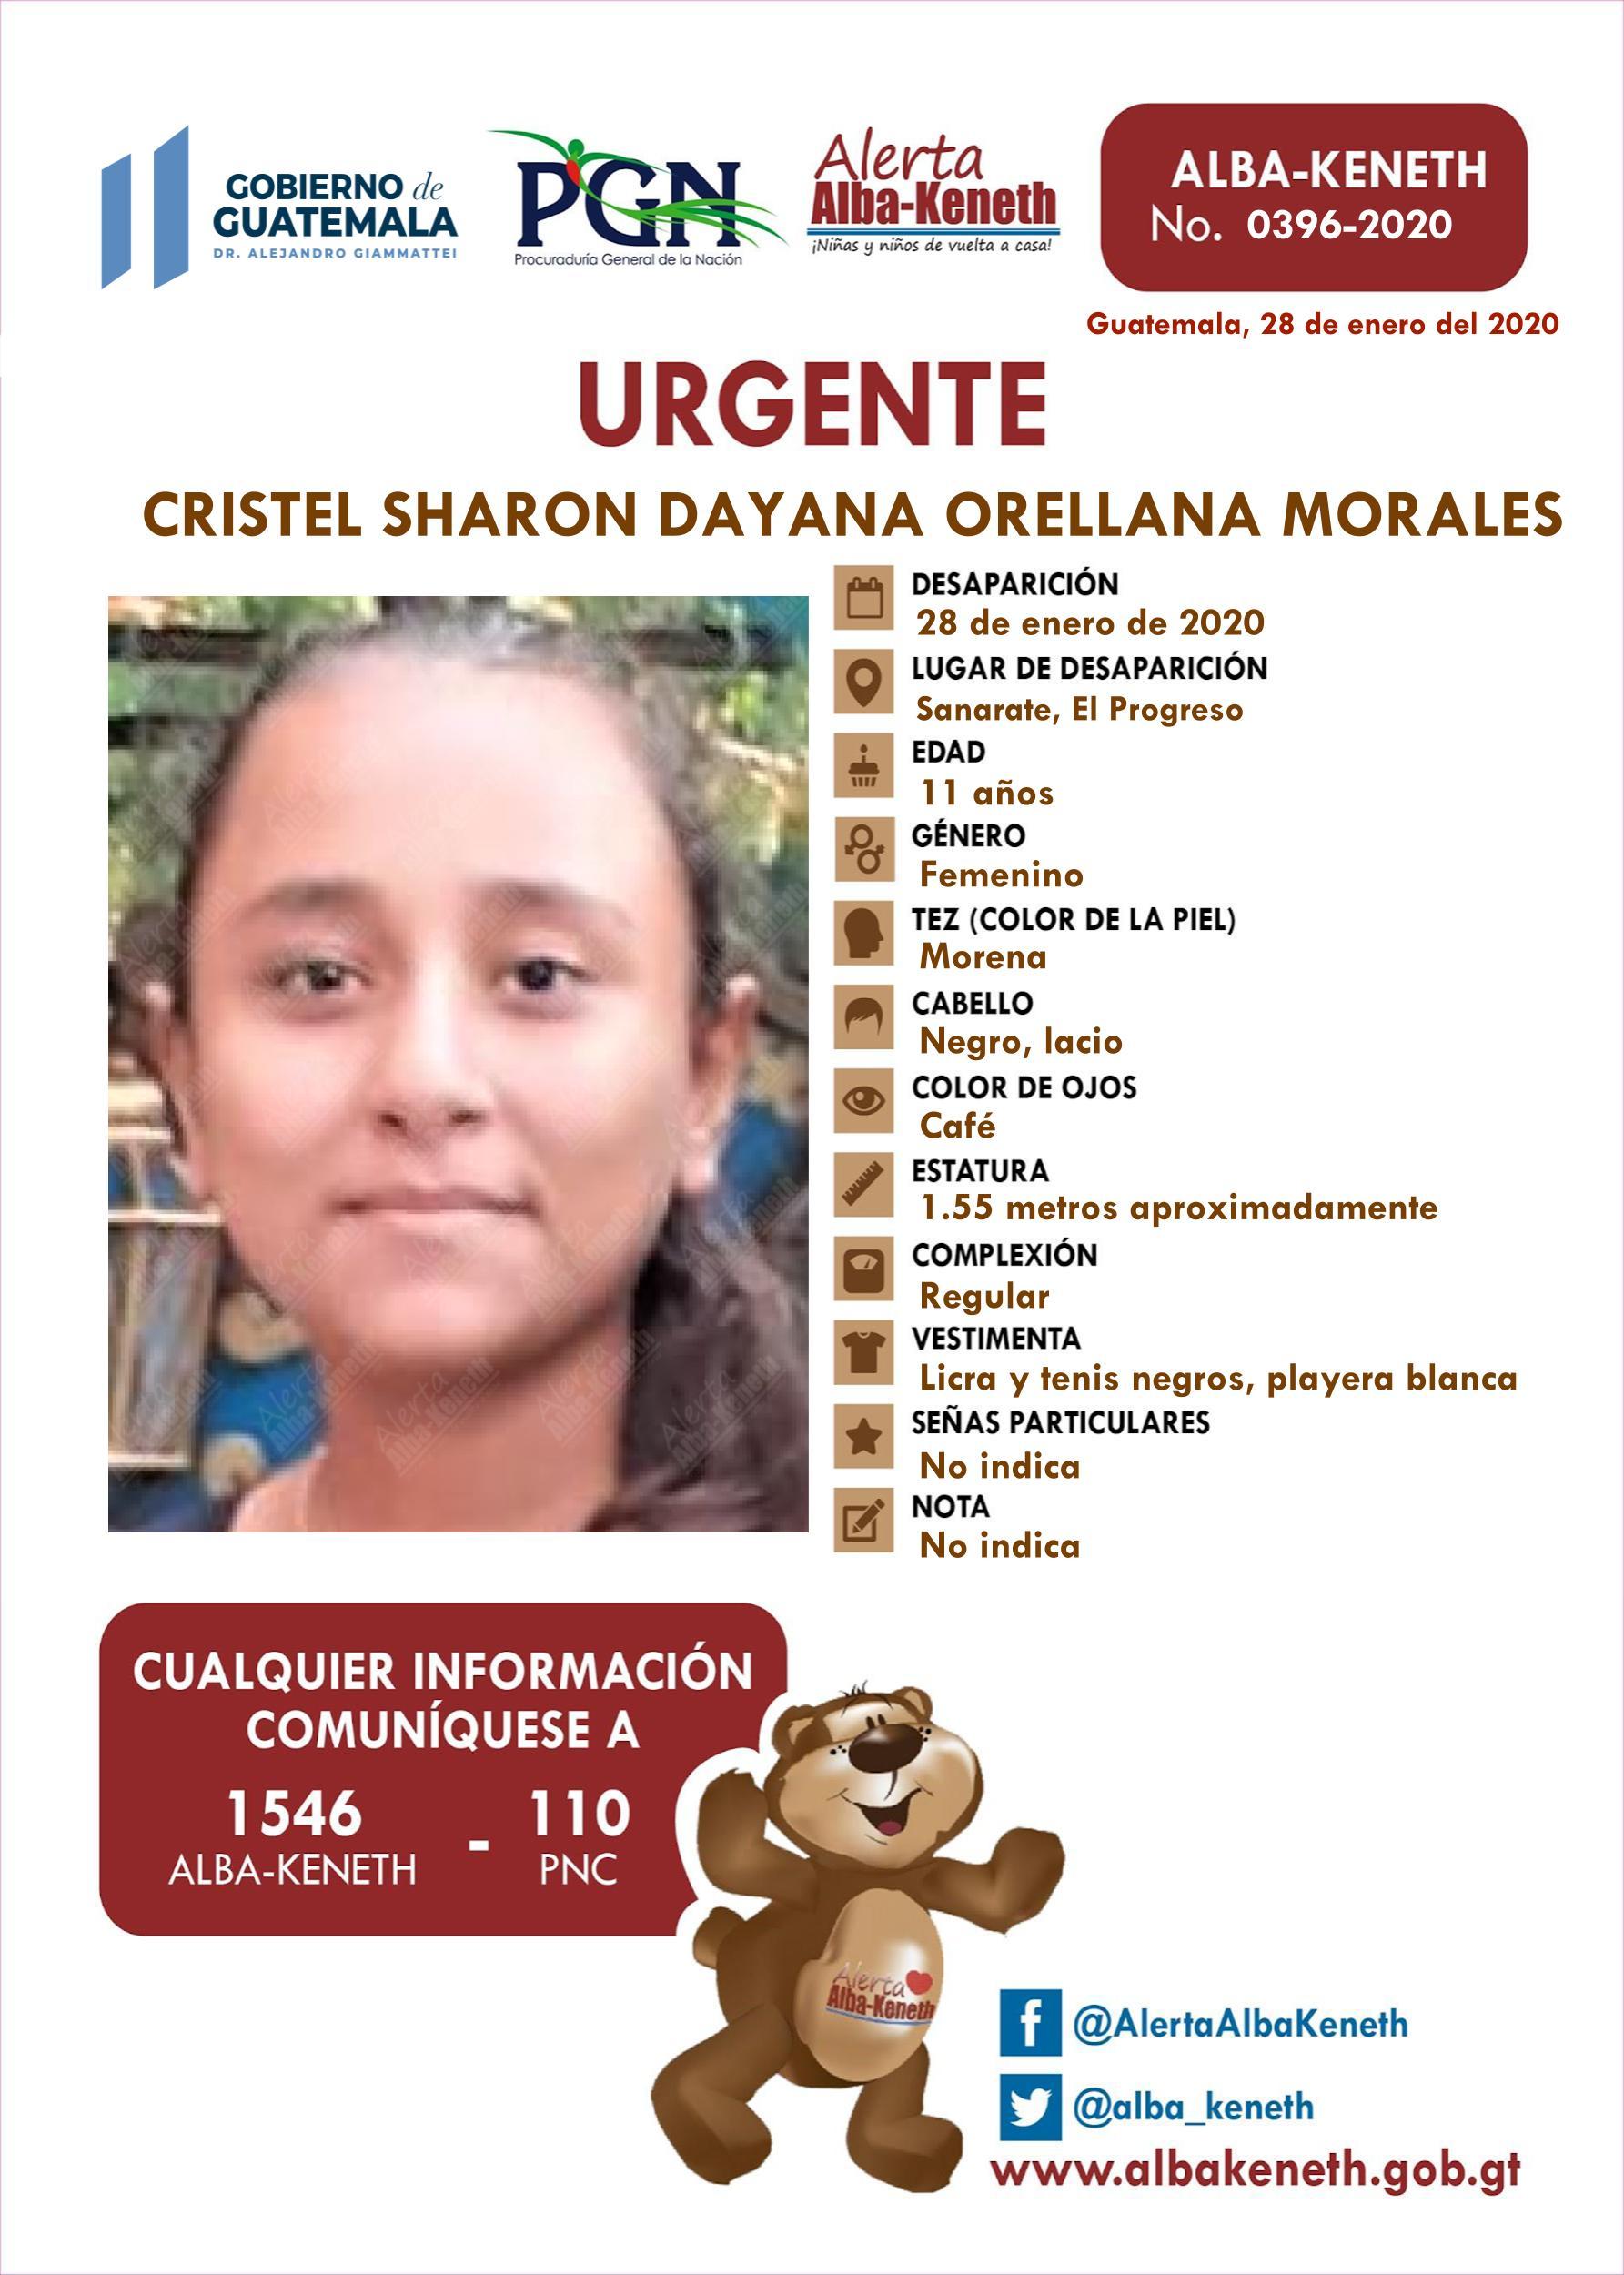 Cristel Sharon Dayana Orellana Morales